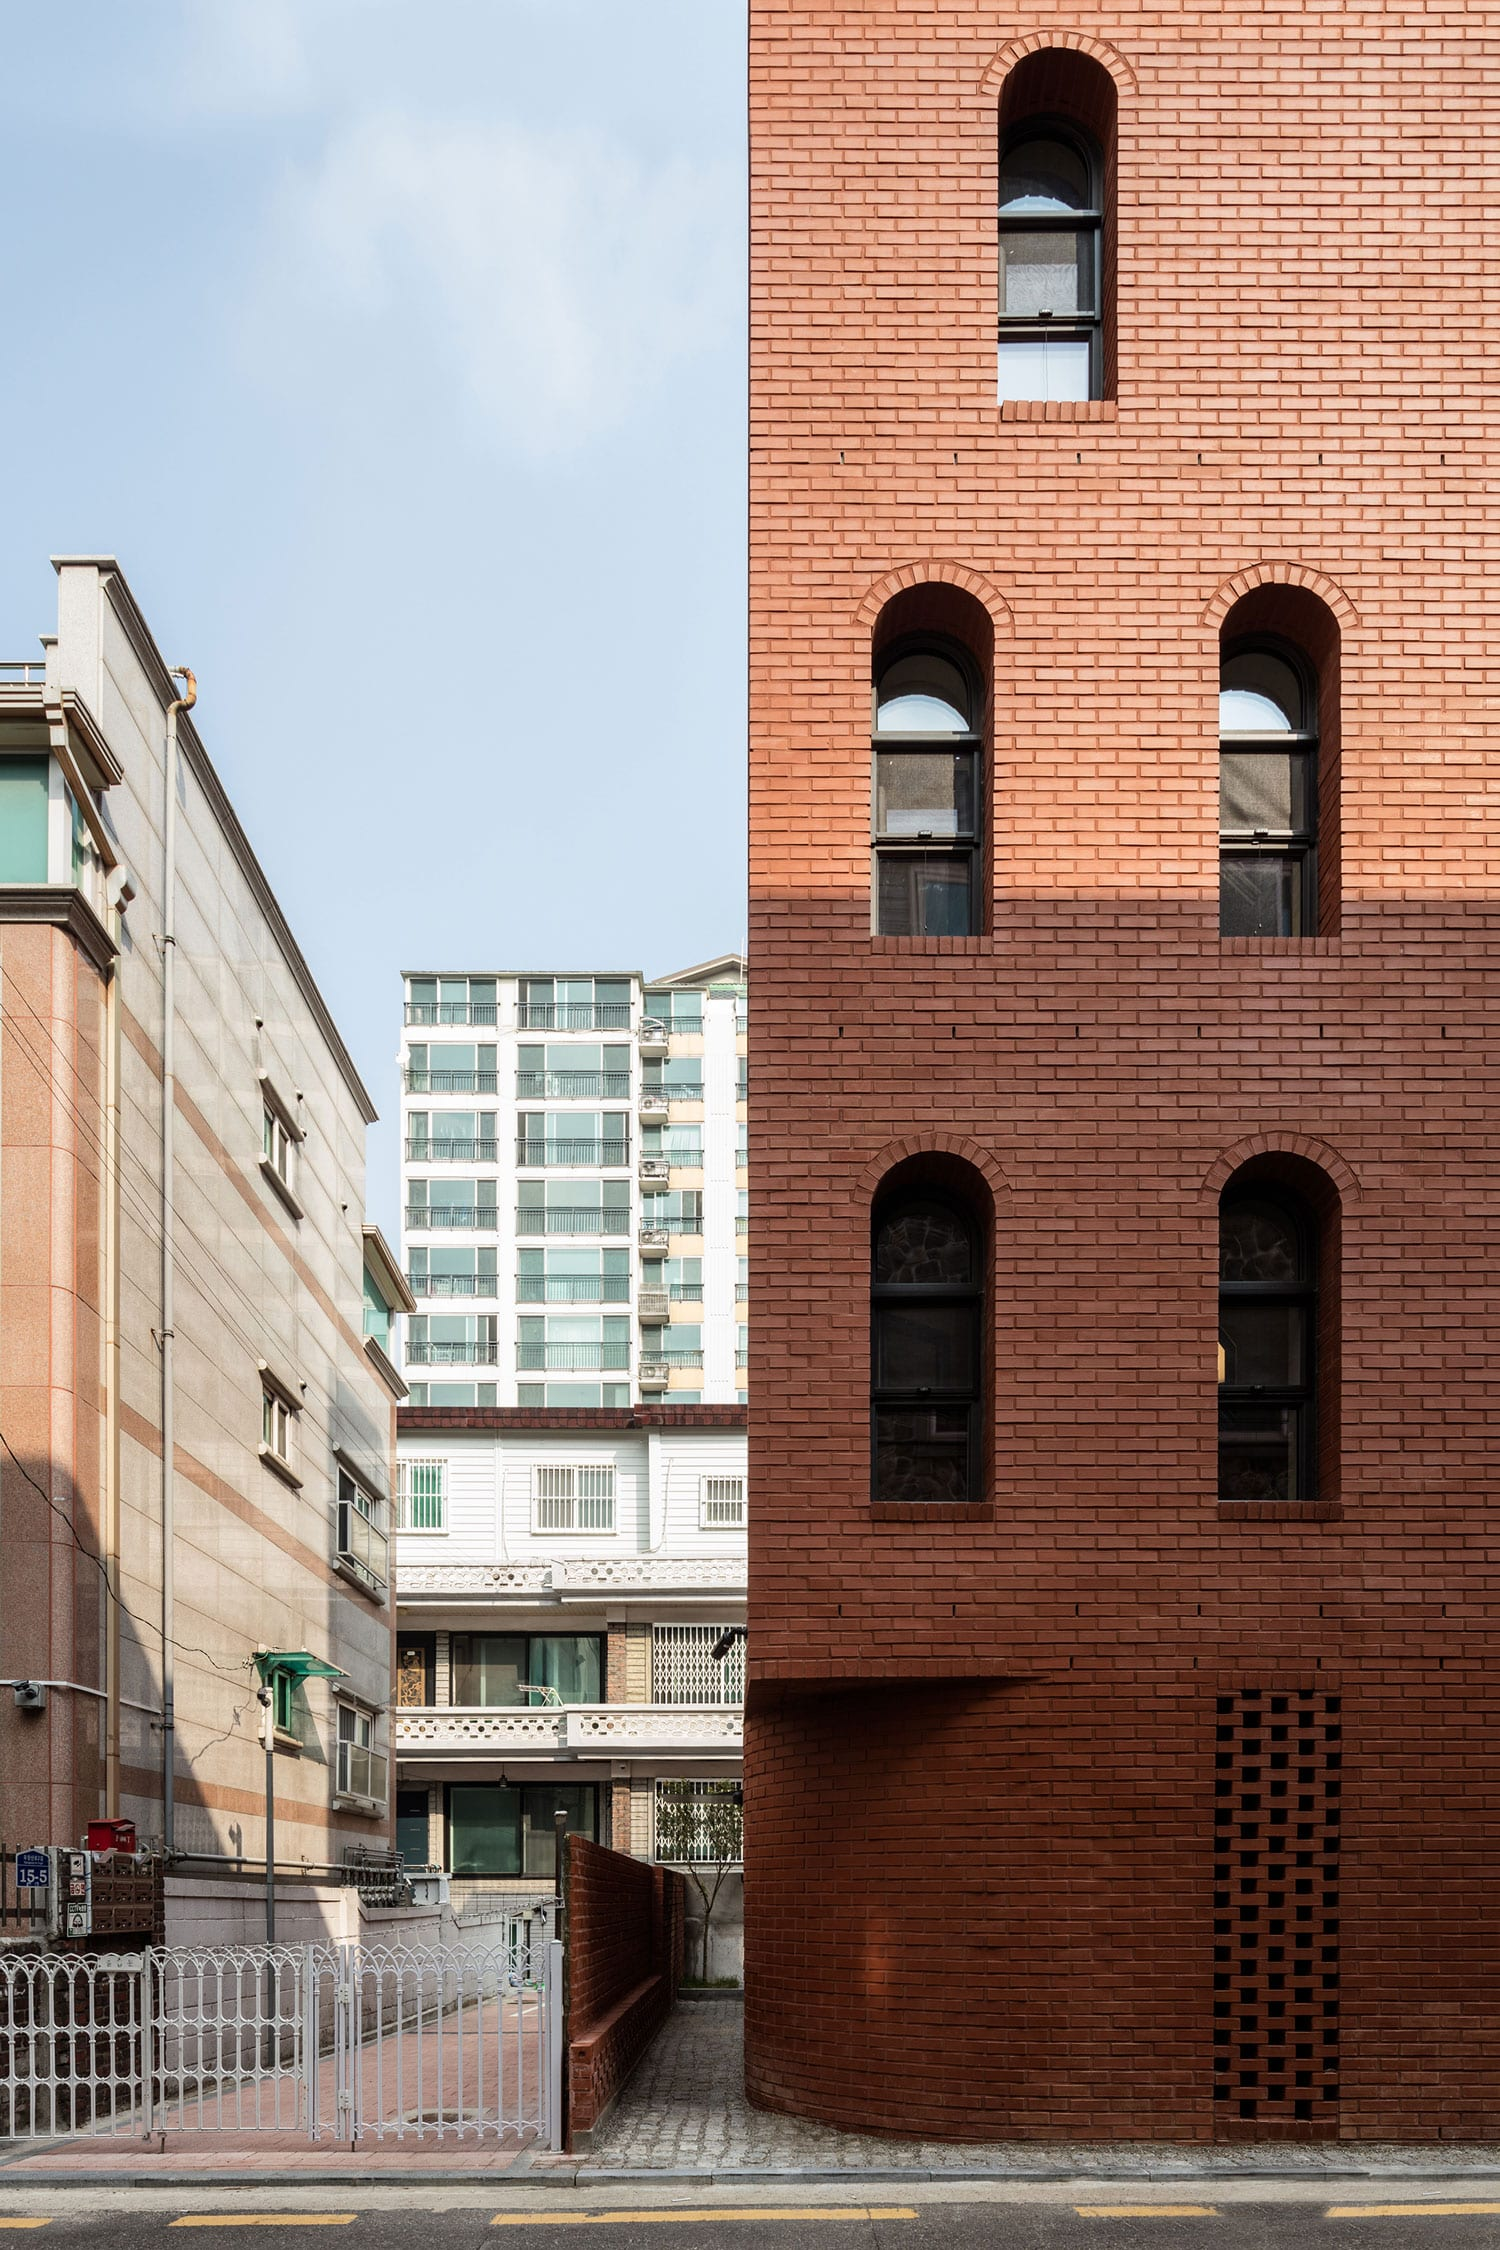 Five Story House by stpmj | Yellowtrace